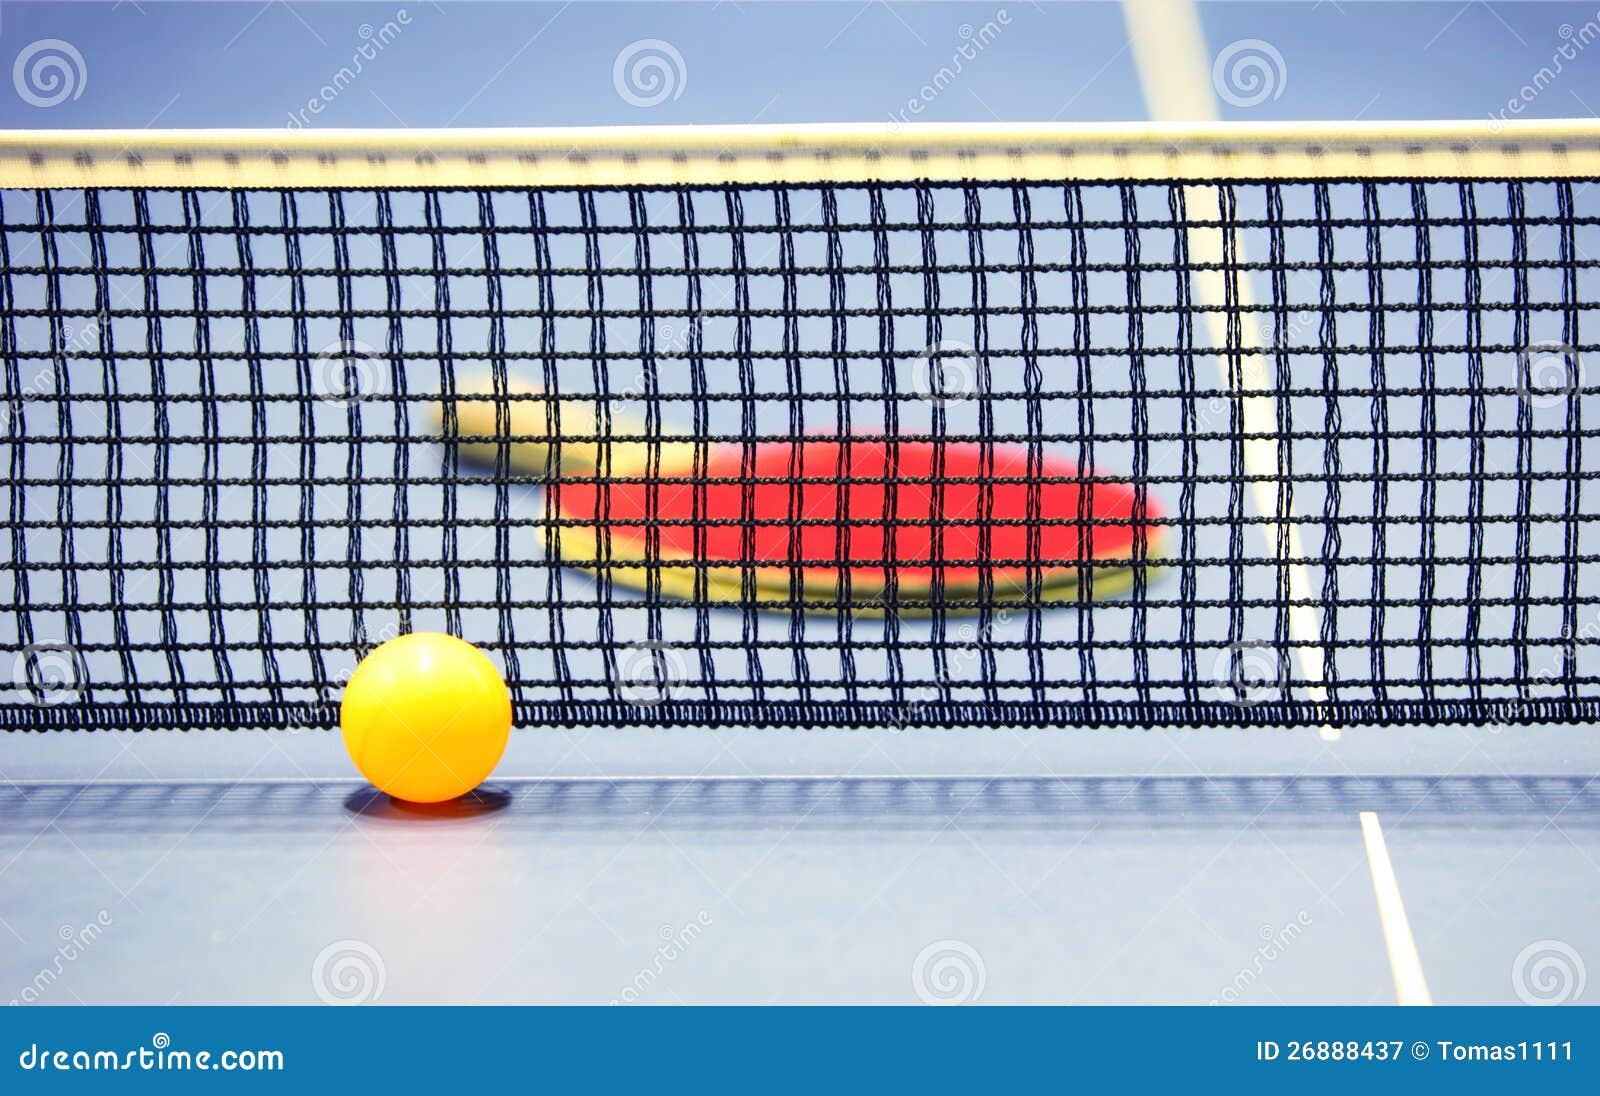 Equipment for table tennis racket ball table stock image image 26888437 - Equipment for table tennis ...